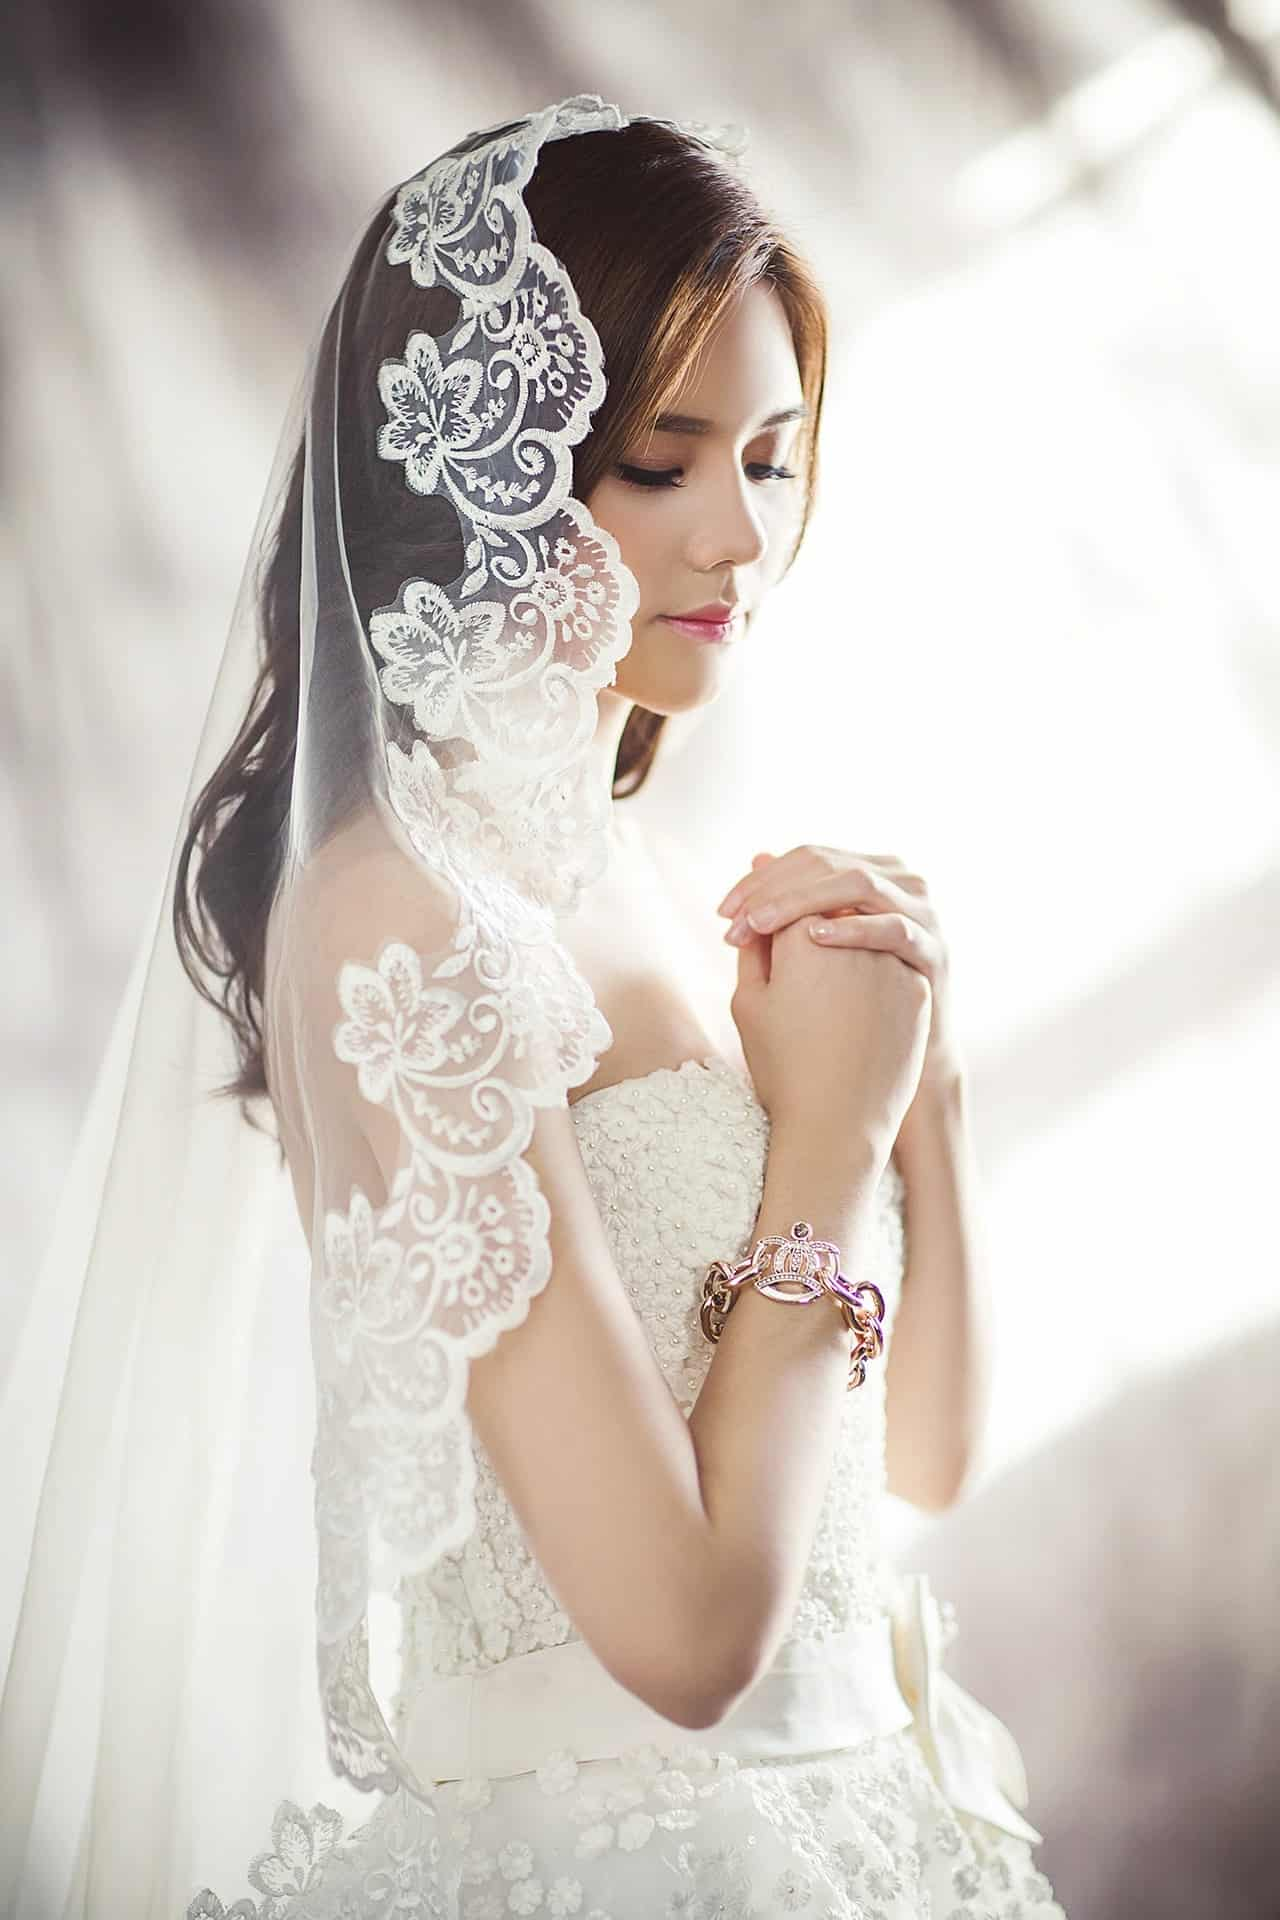 wedding-dresses-1486256_1920